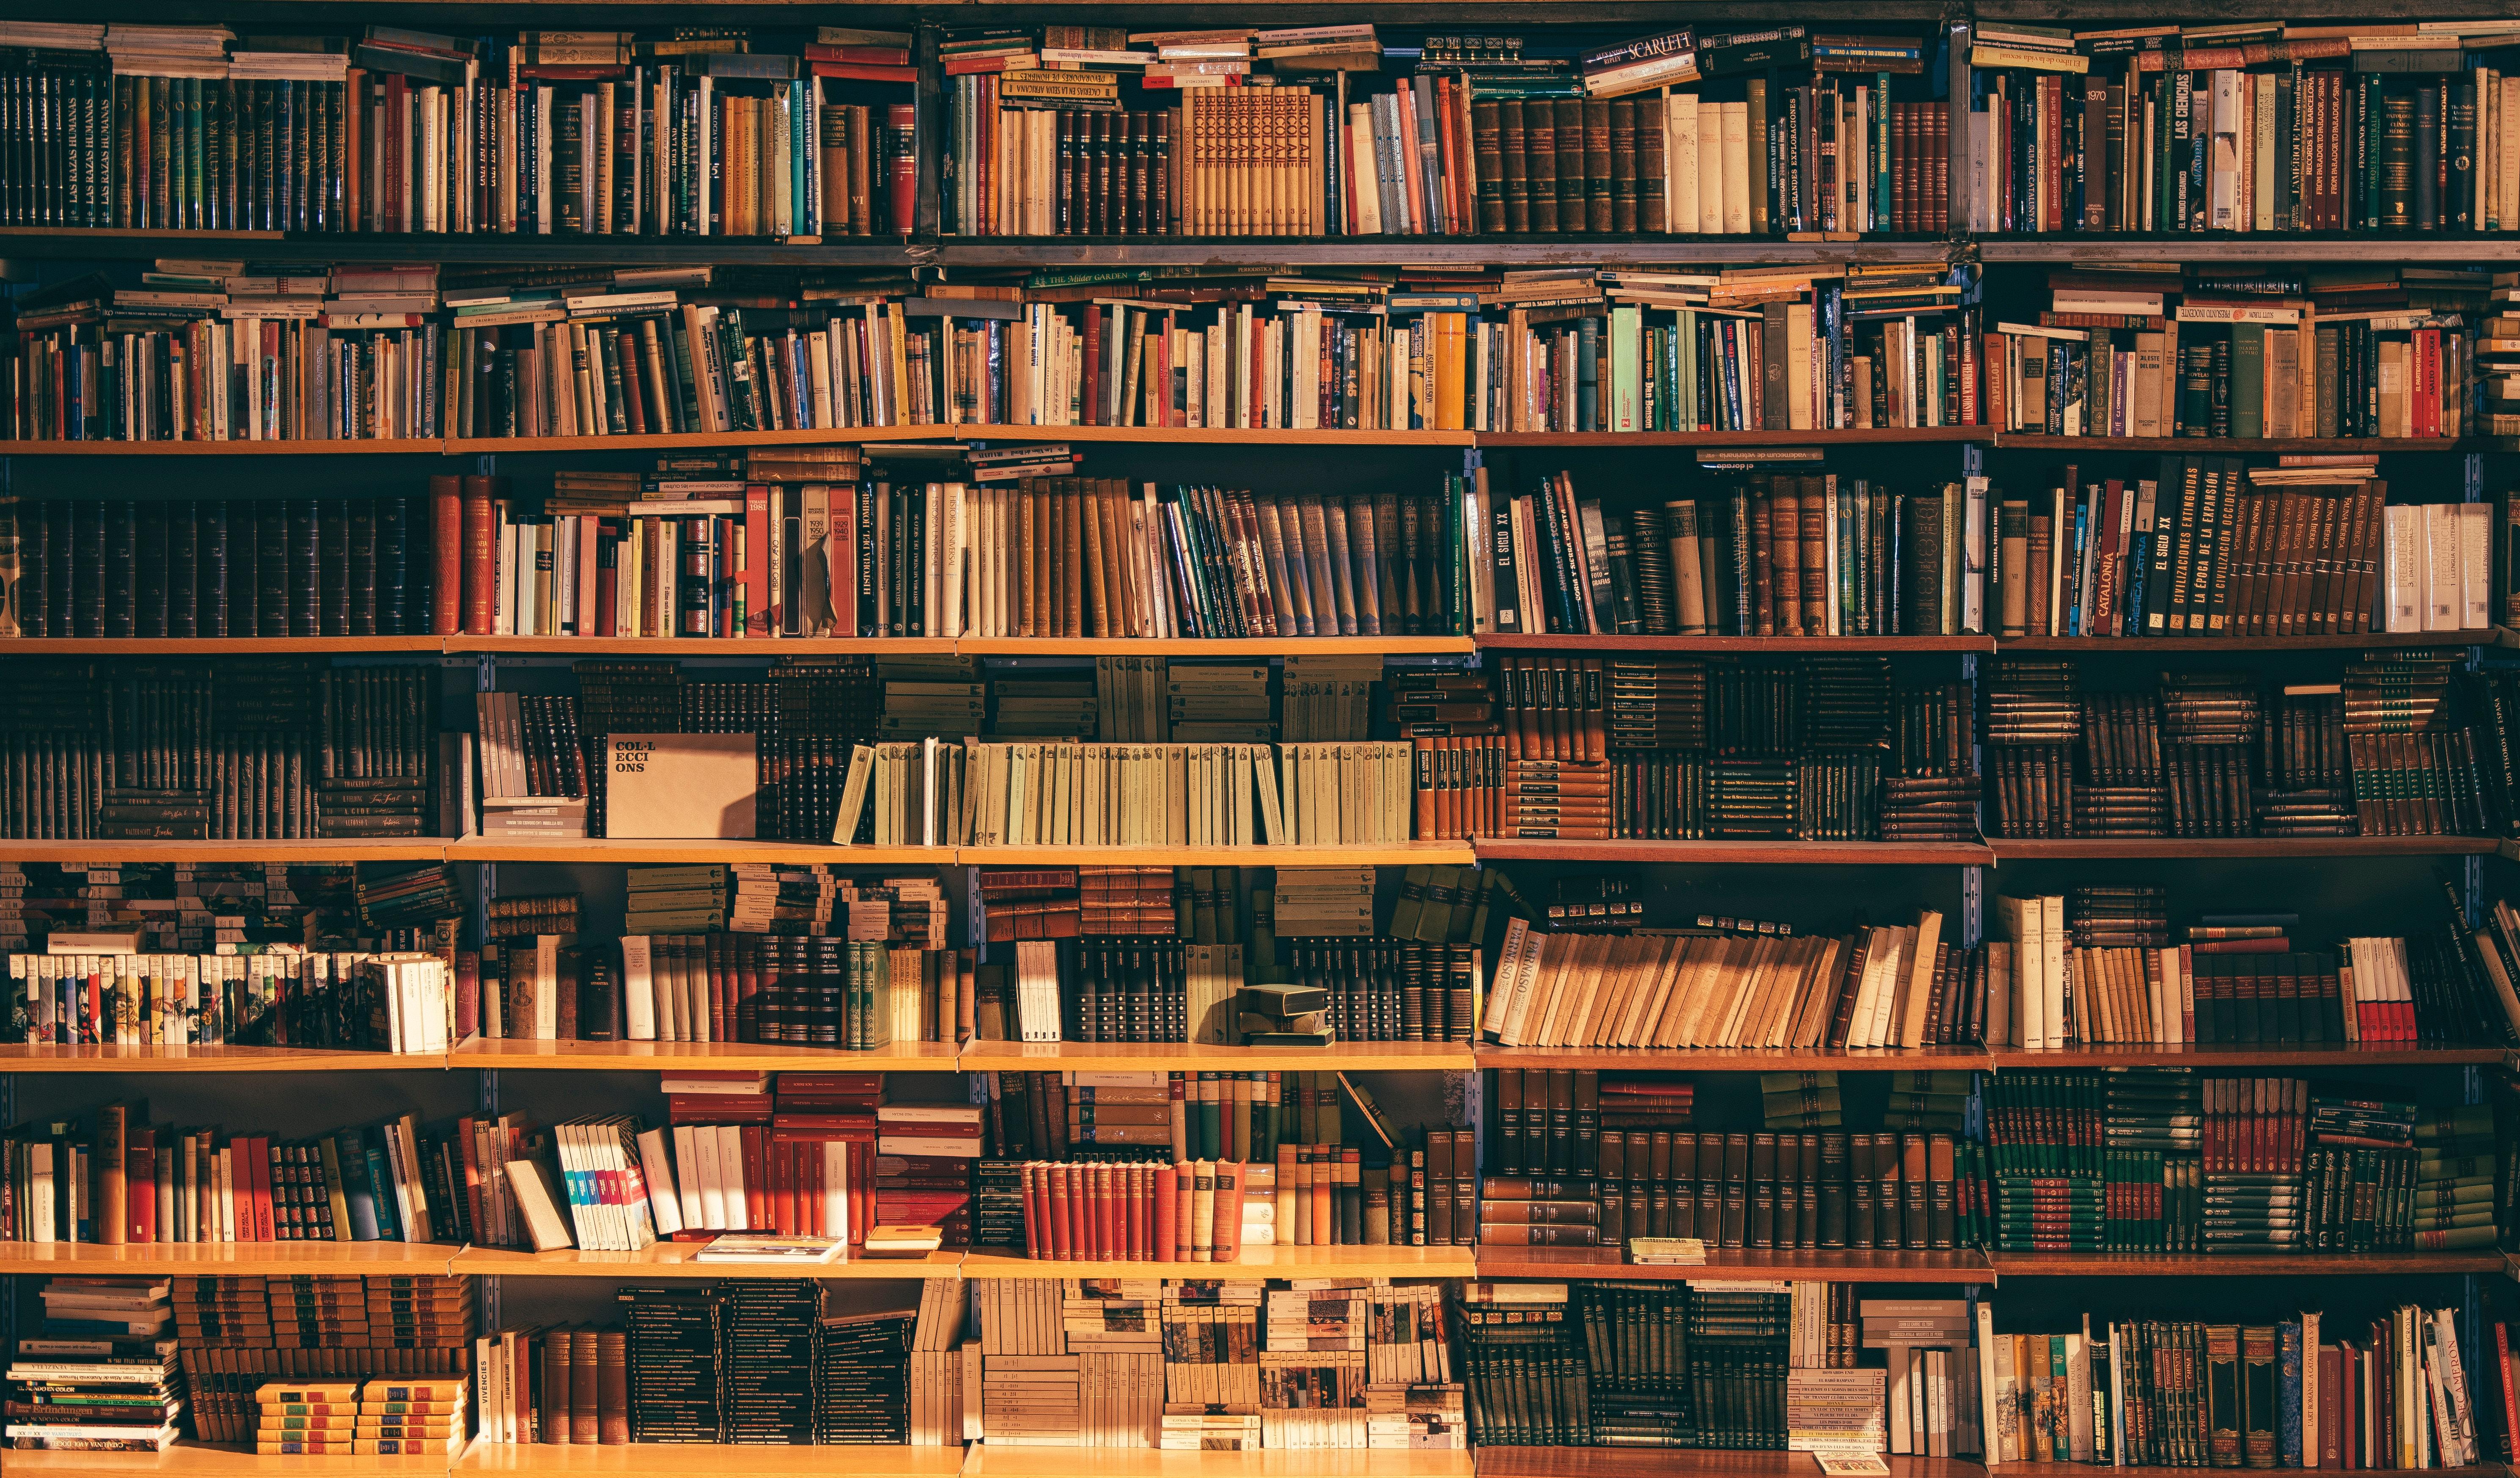 General 5957x3493 library university books book shelf bookshelves brown